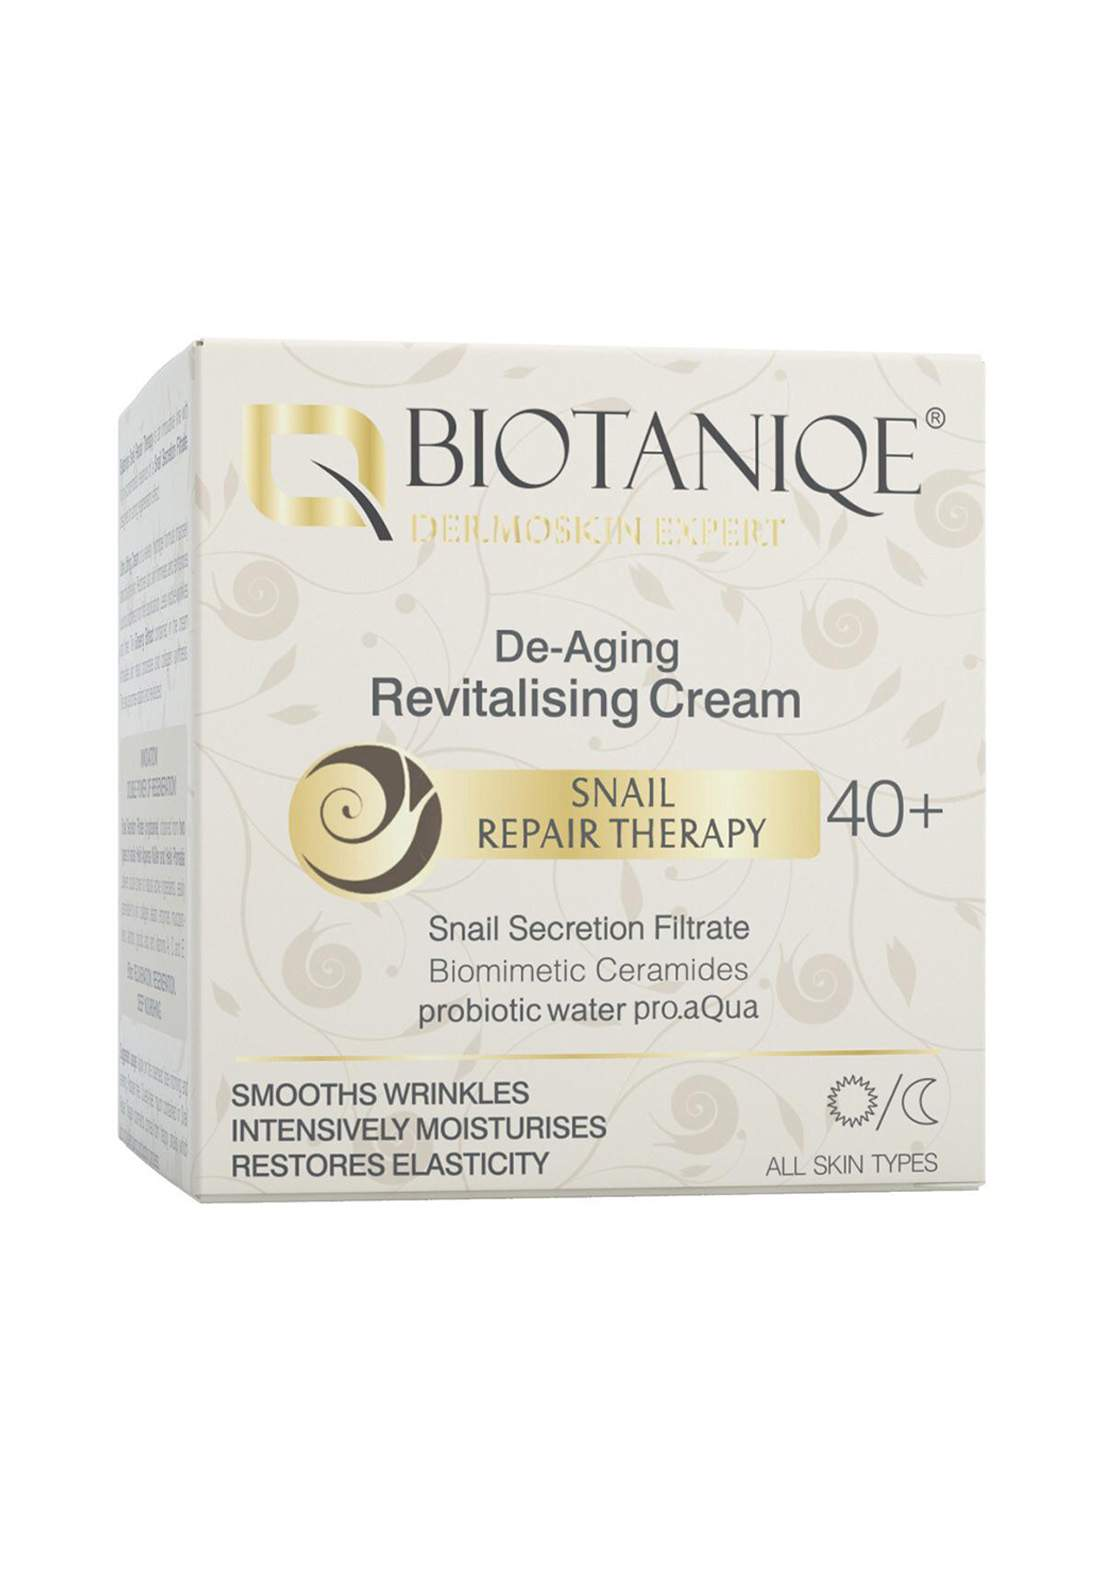 Biotaniqe De-Aging Revitalising Cream 50ml كريم مقاوم للتجاعيد